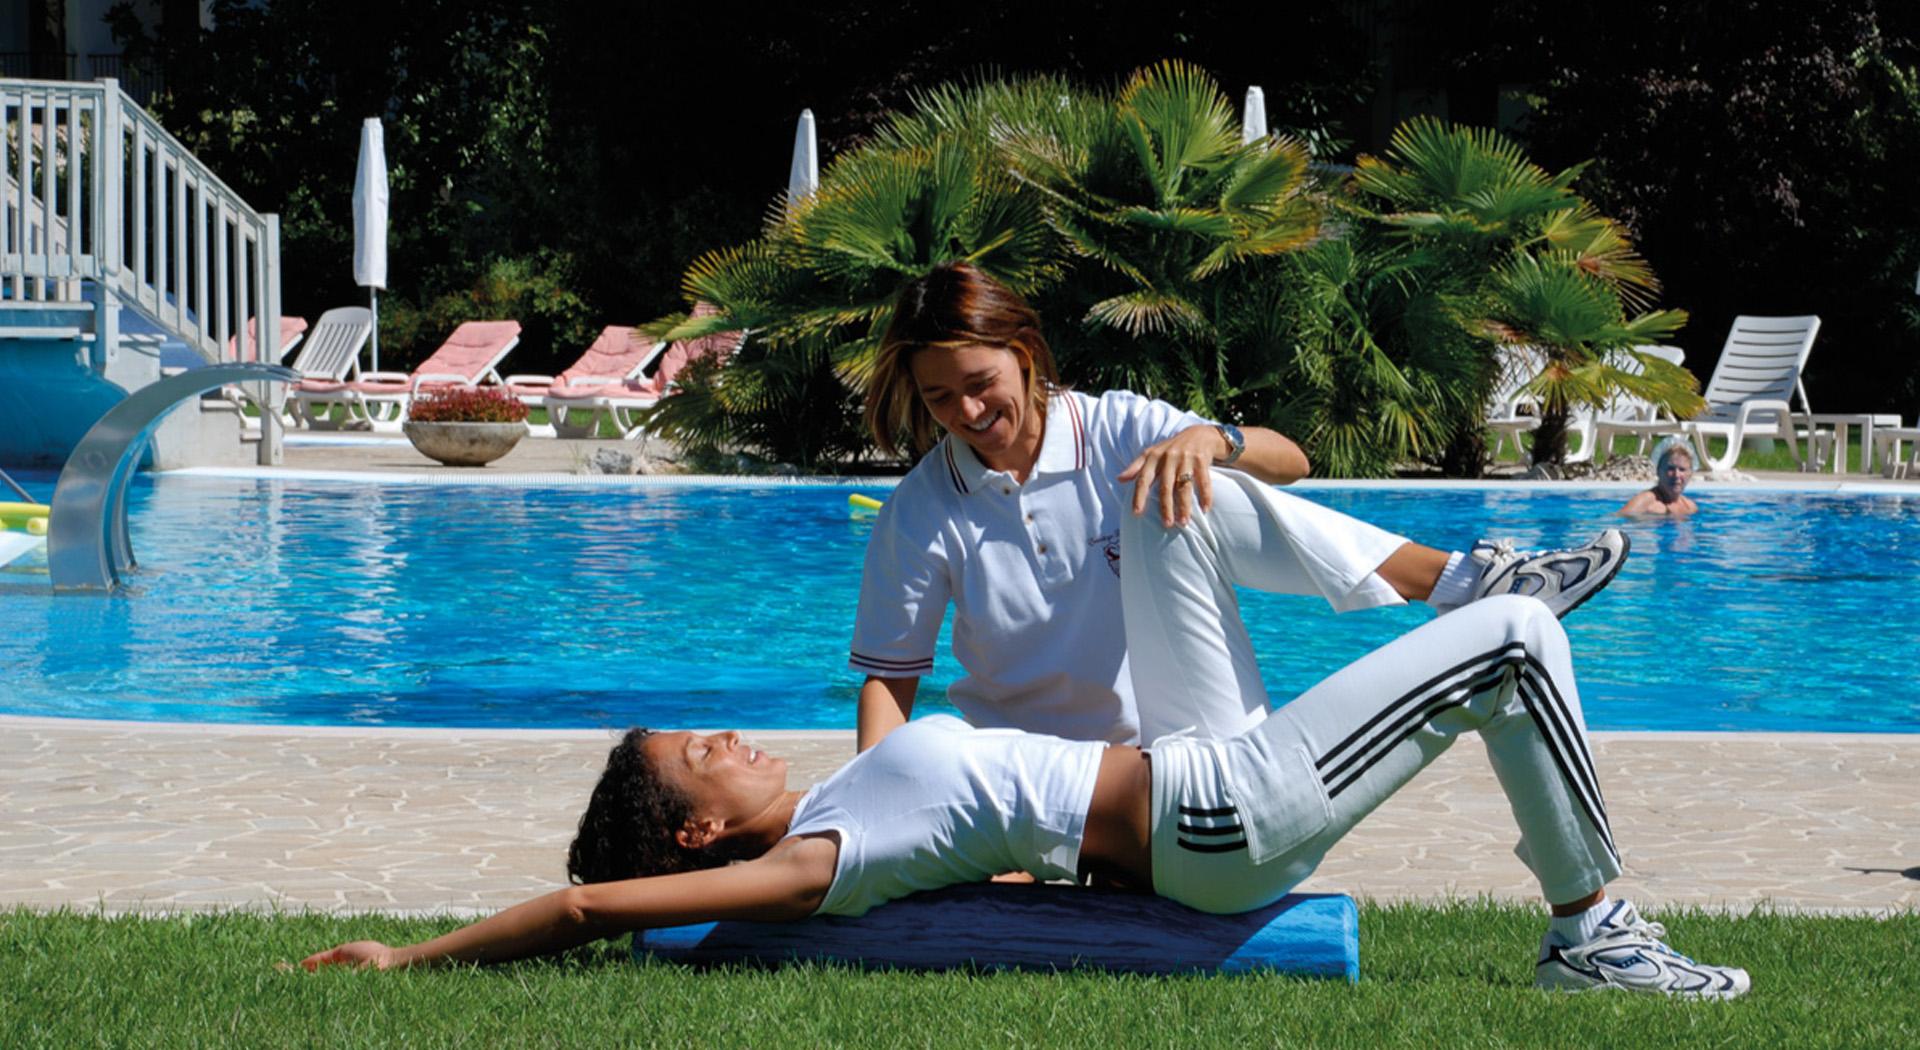 fisioterapia termale